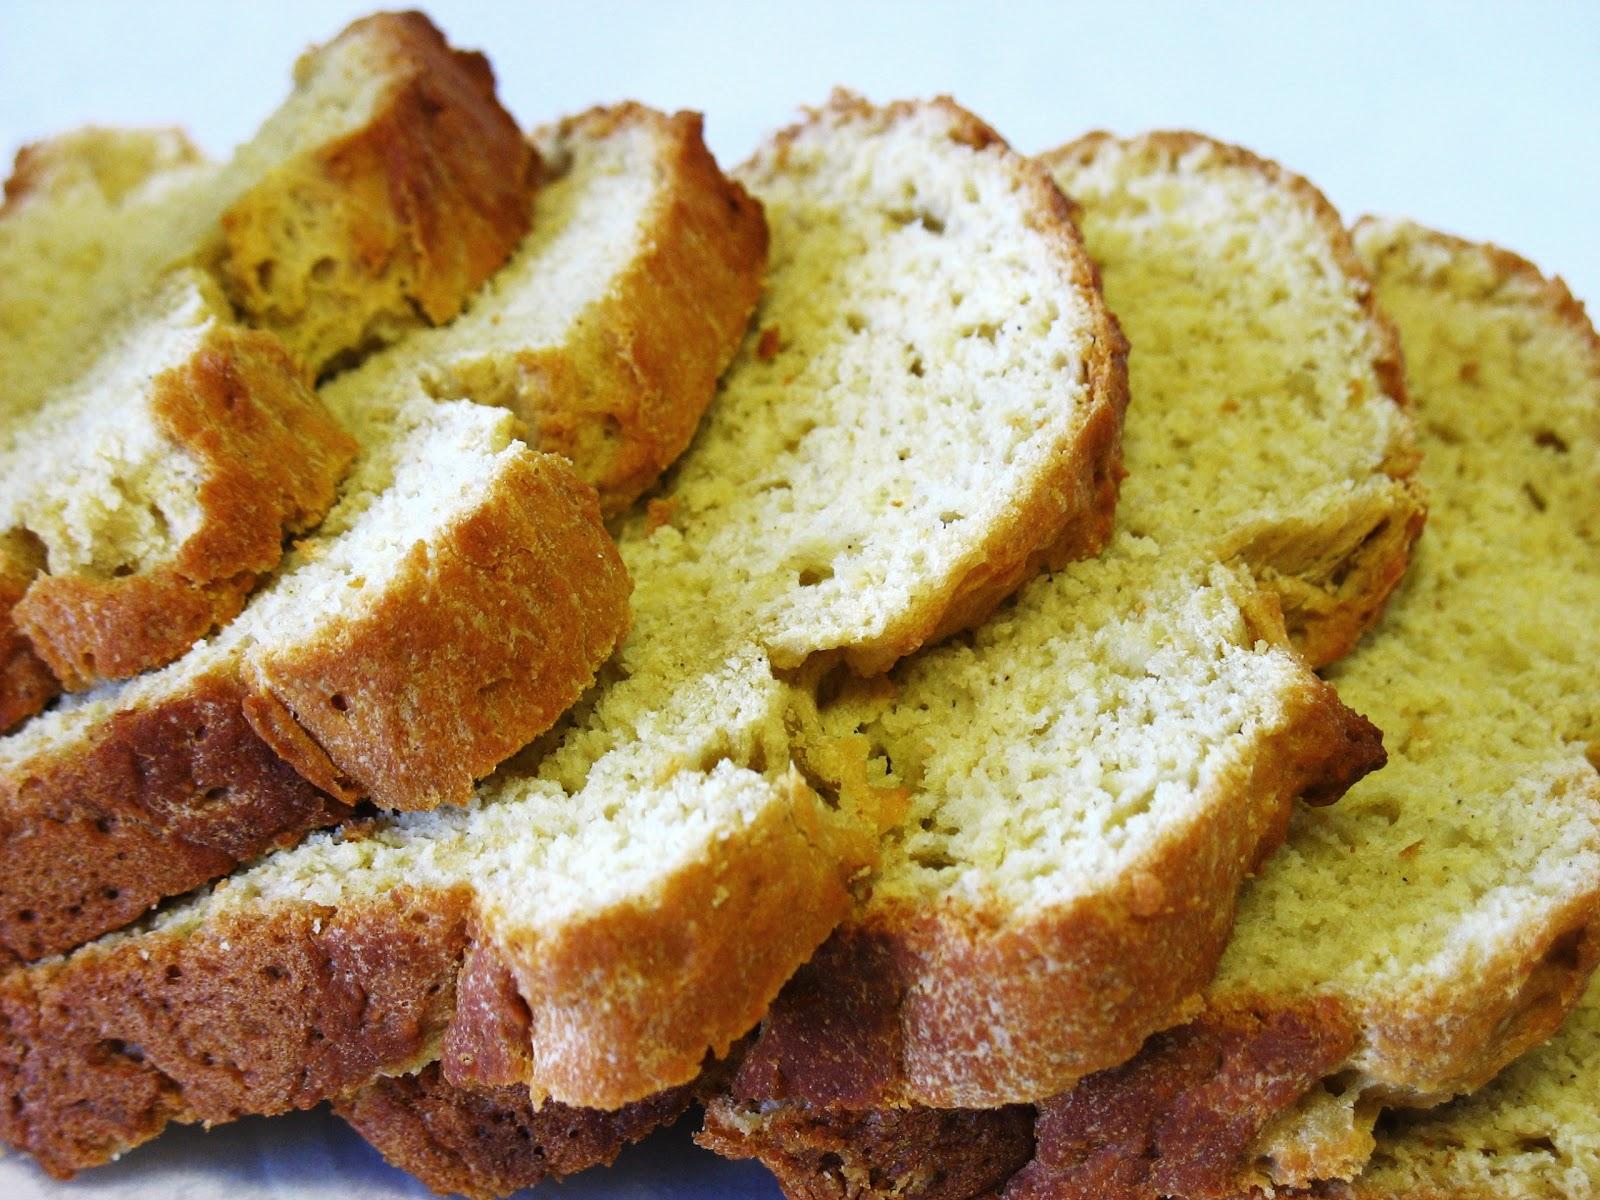 Bread 2.0 | Gluten Free Bread Recipe | Elana's Pantry